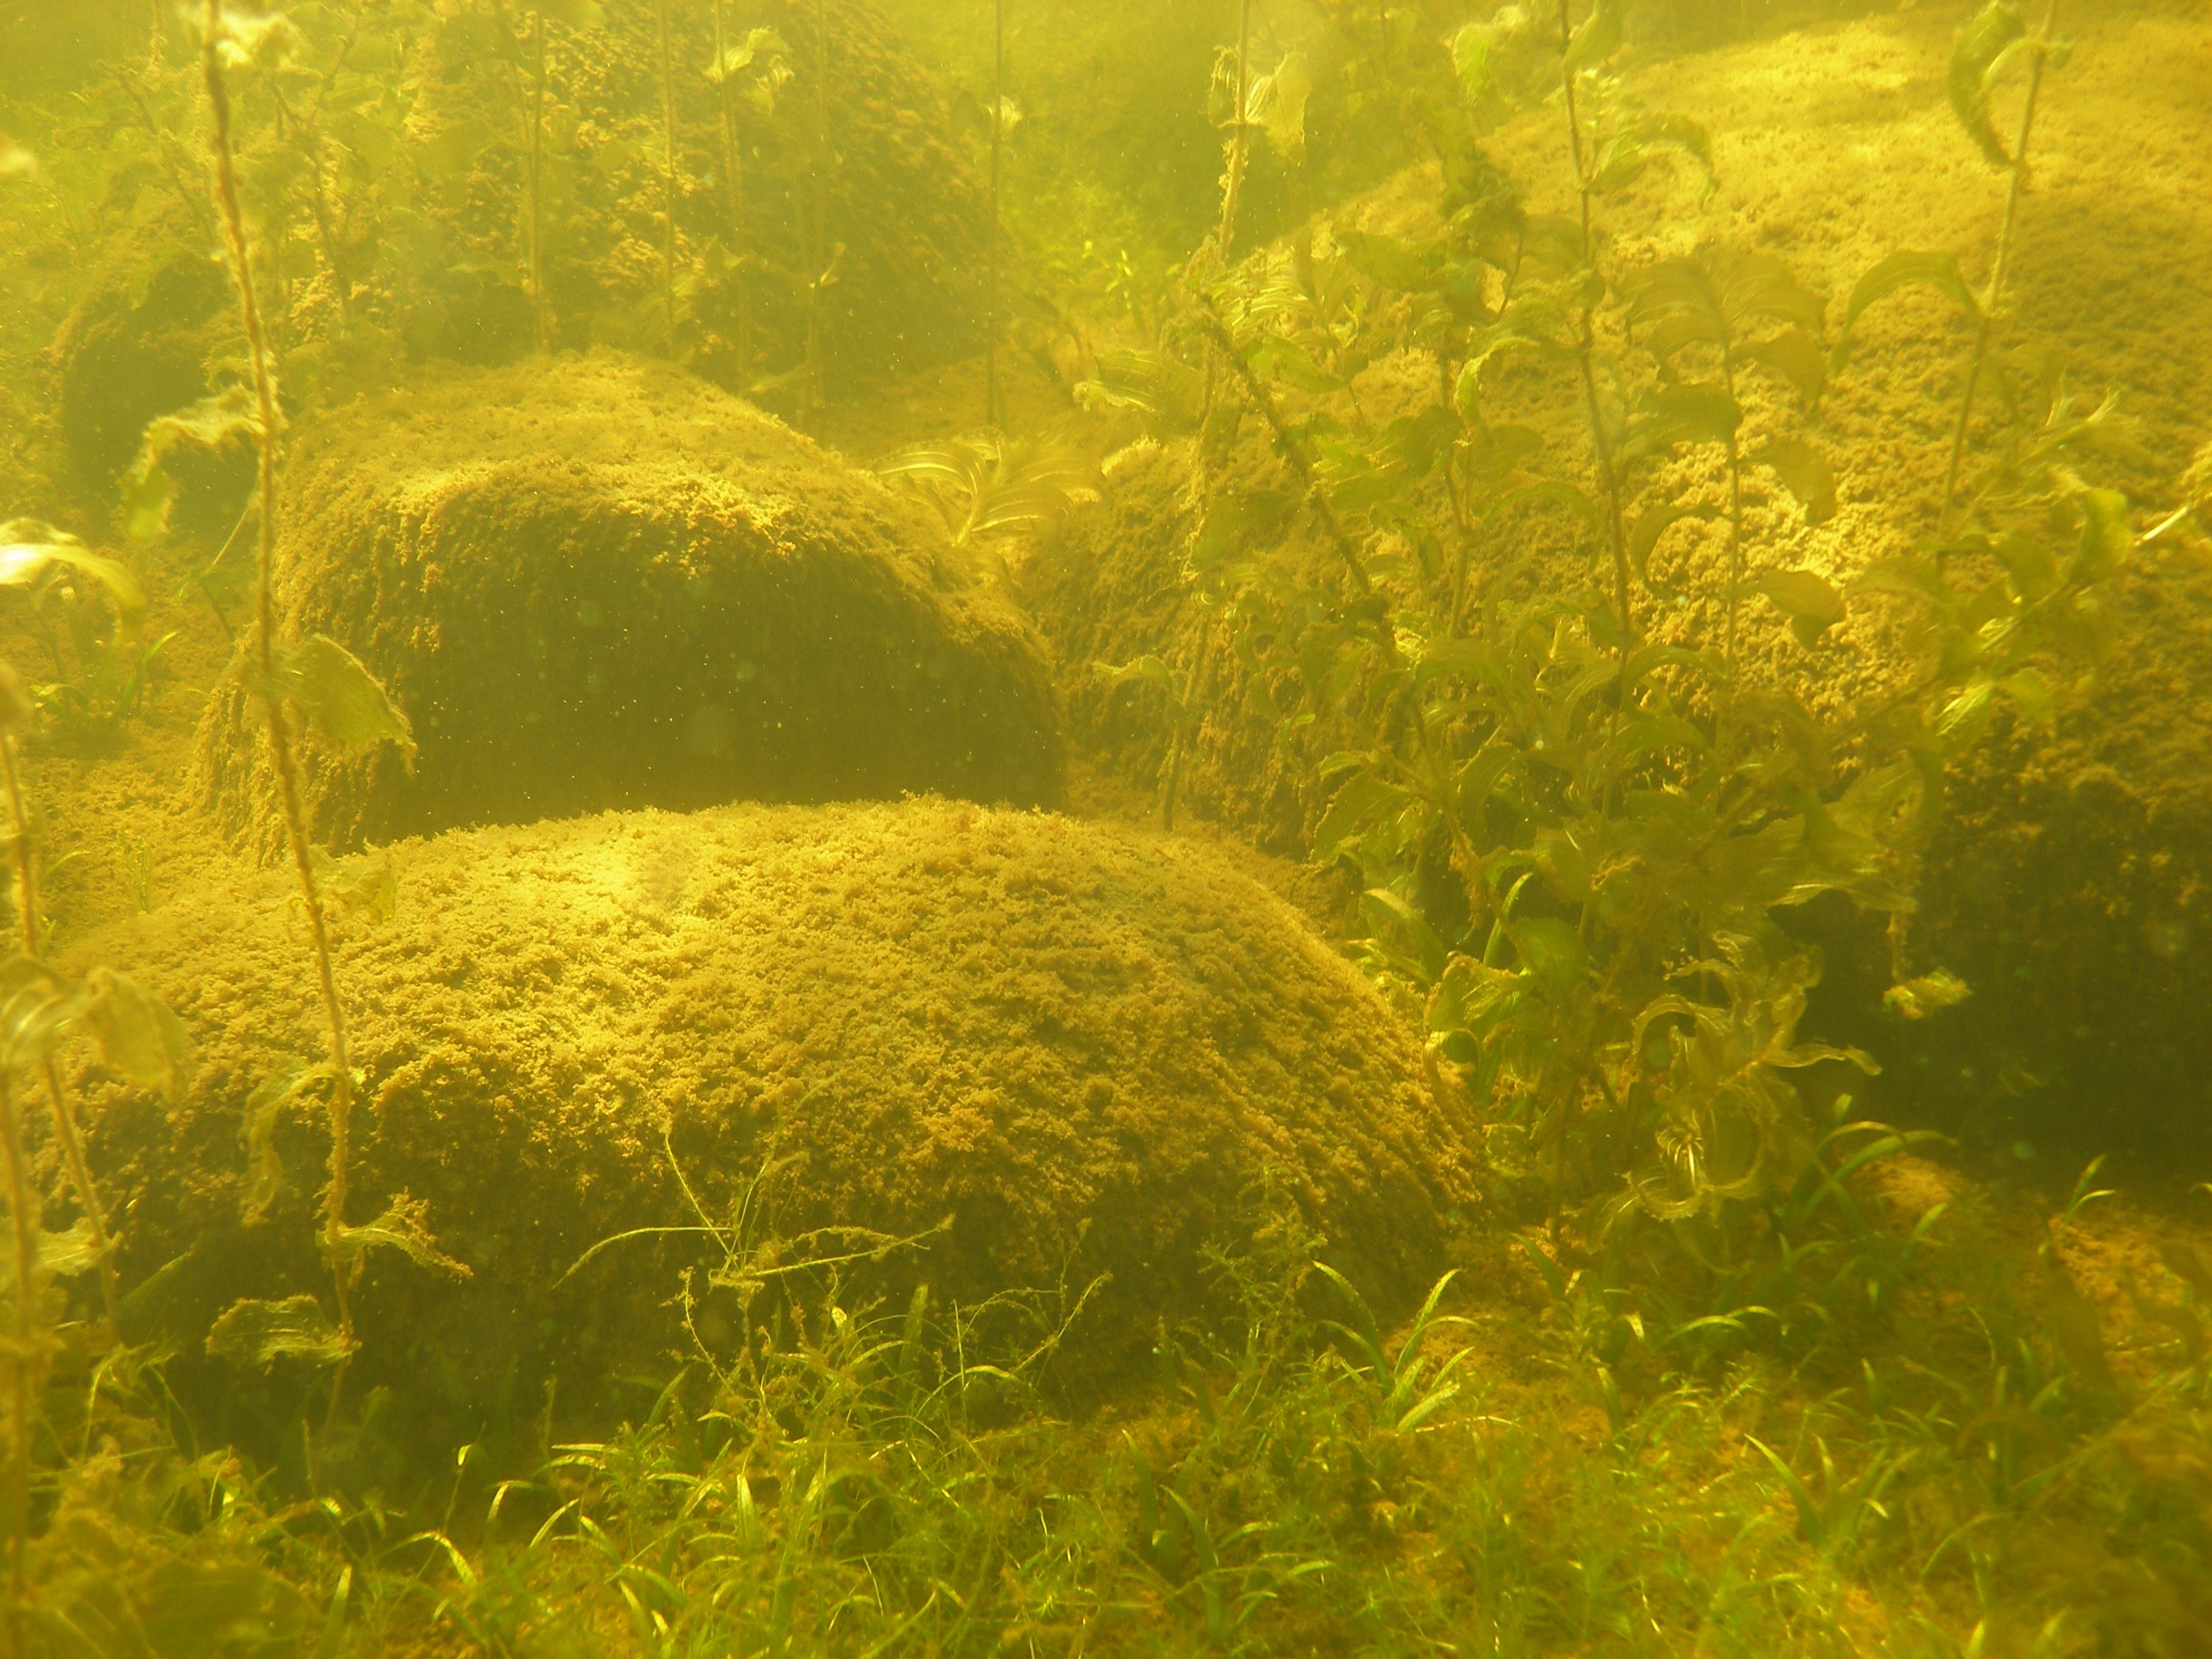 Big rocks and lot of vegetation.